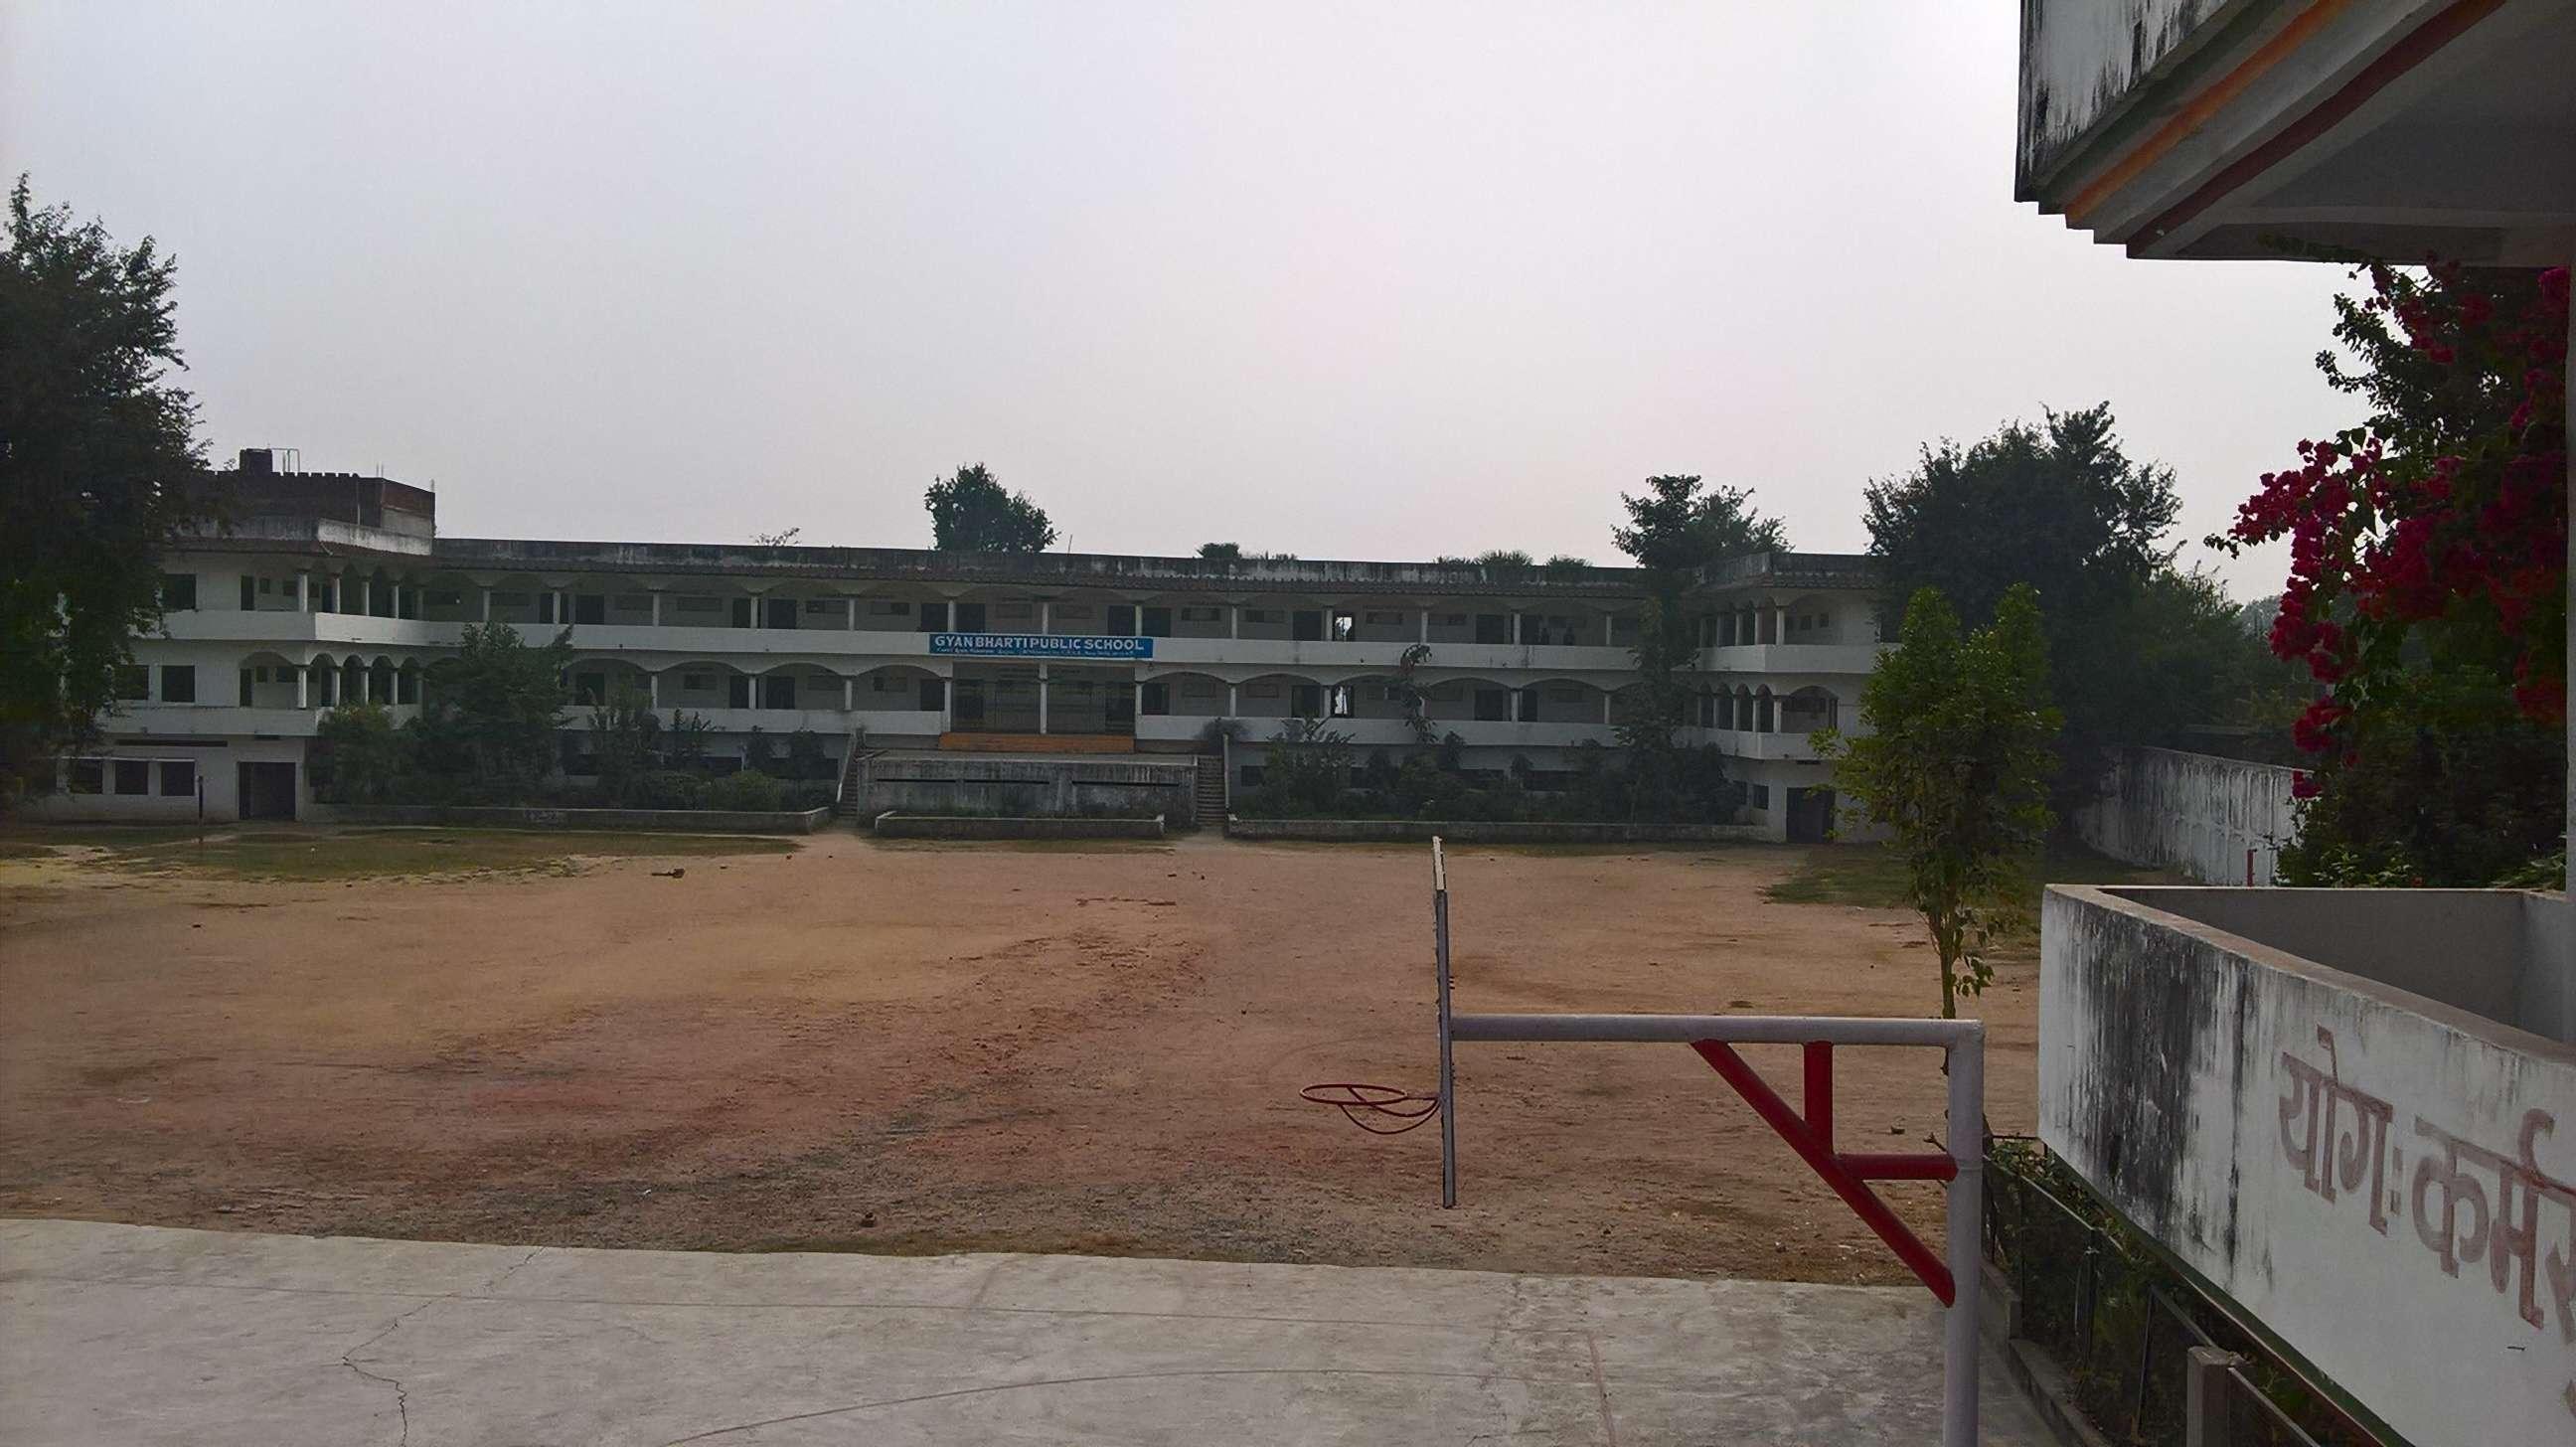 GYAN BHARTI PUBLIC SCHOOL PAHARPUR CANT AREA PO CHAND CHAURA GAYA BIHAR 330106